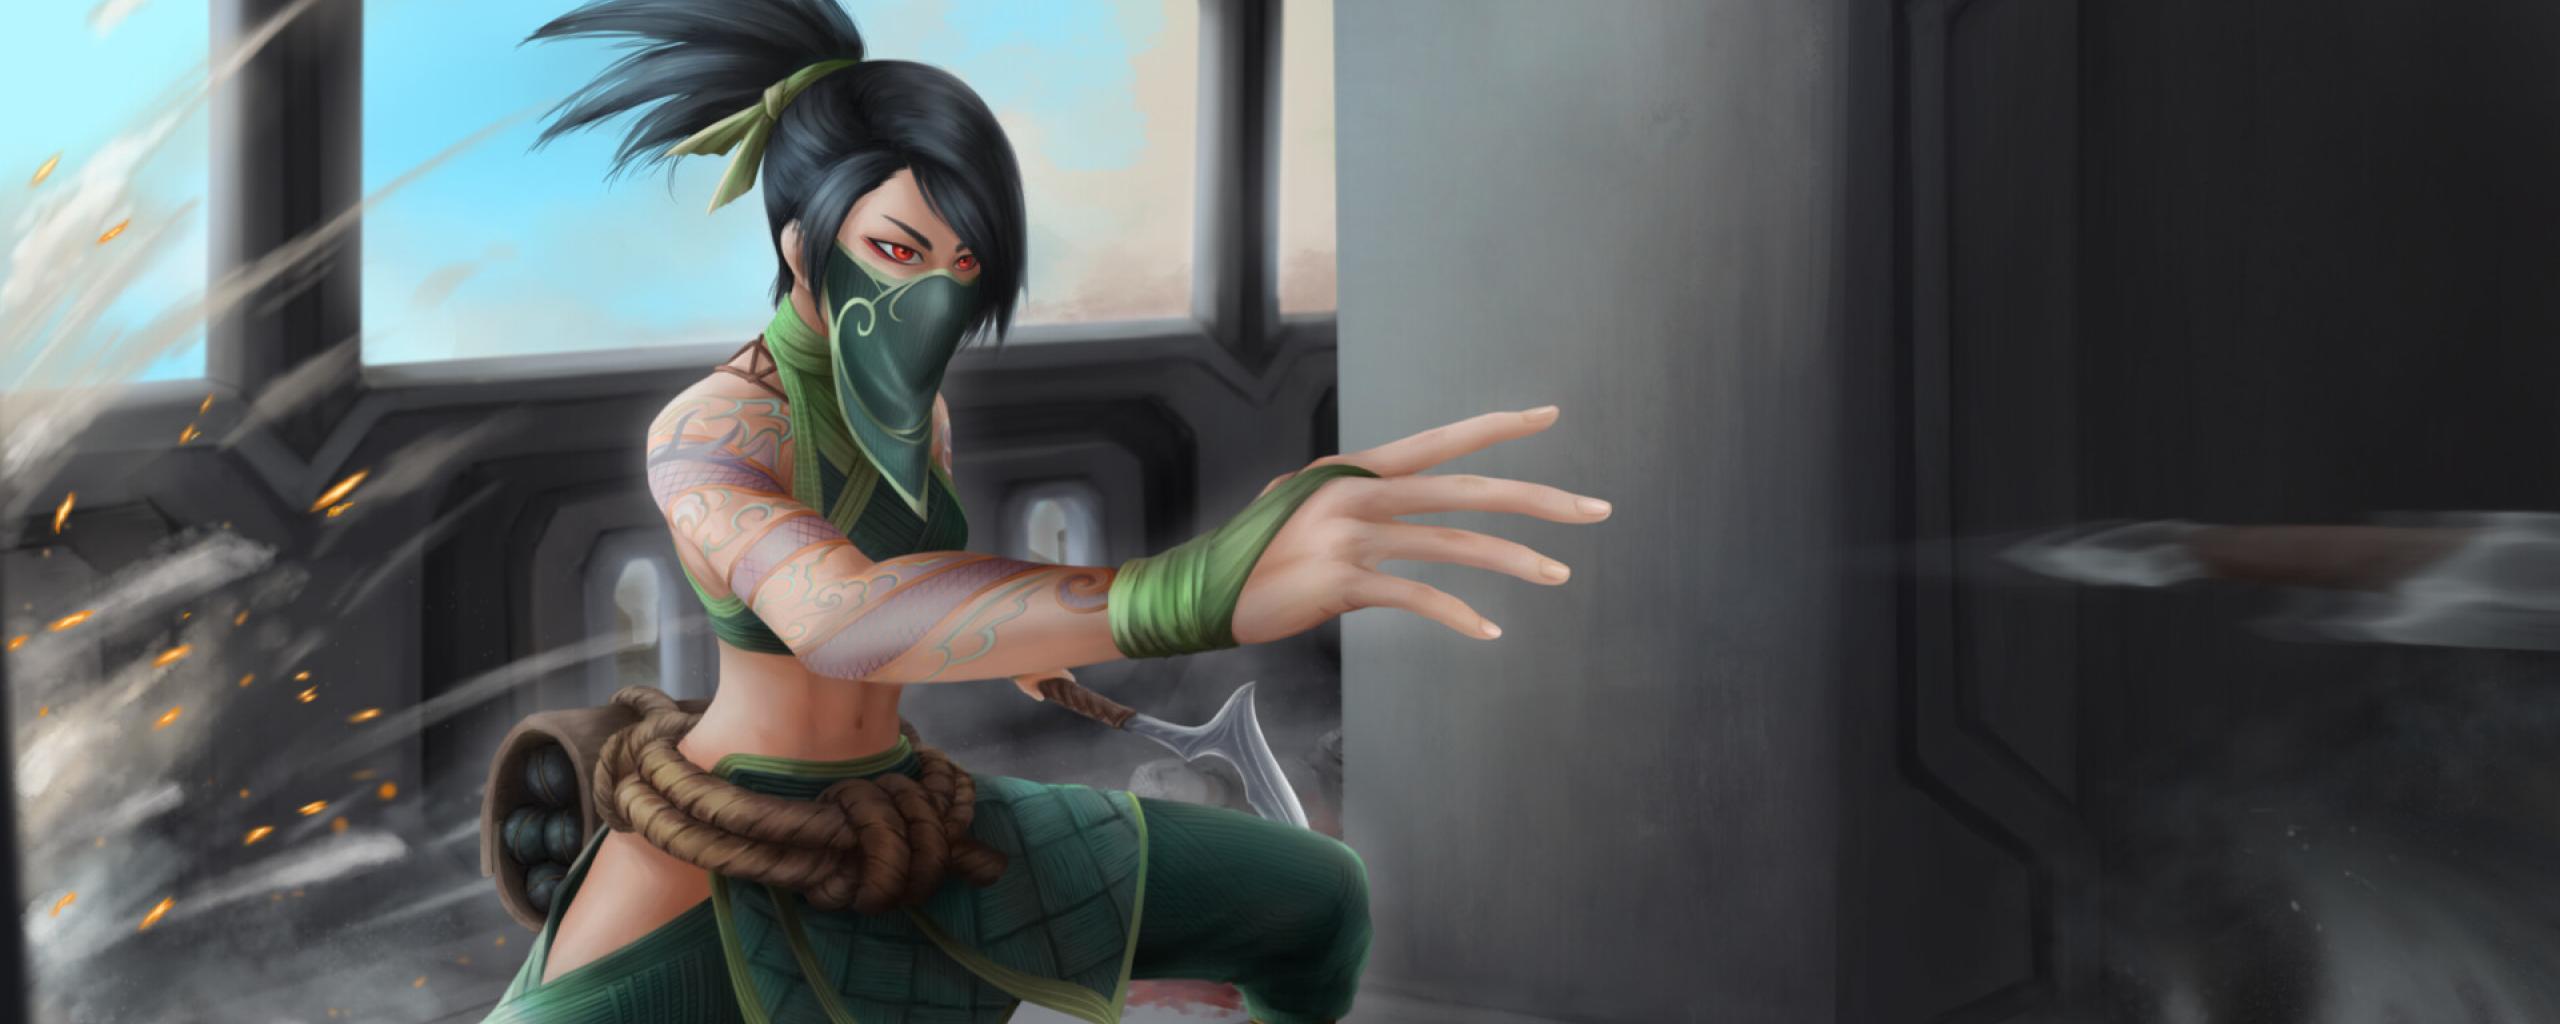 Akali from League Of Legends Wallpaper in 2560x1024 Resolution